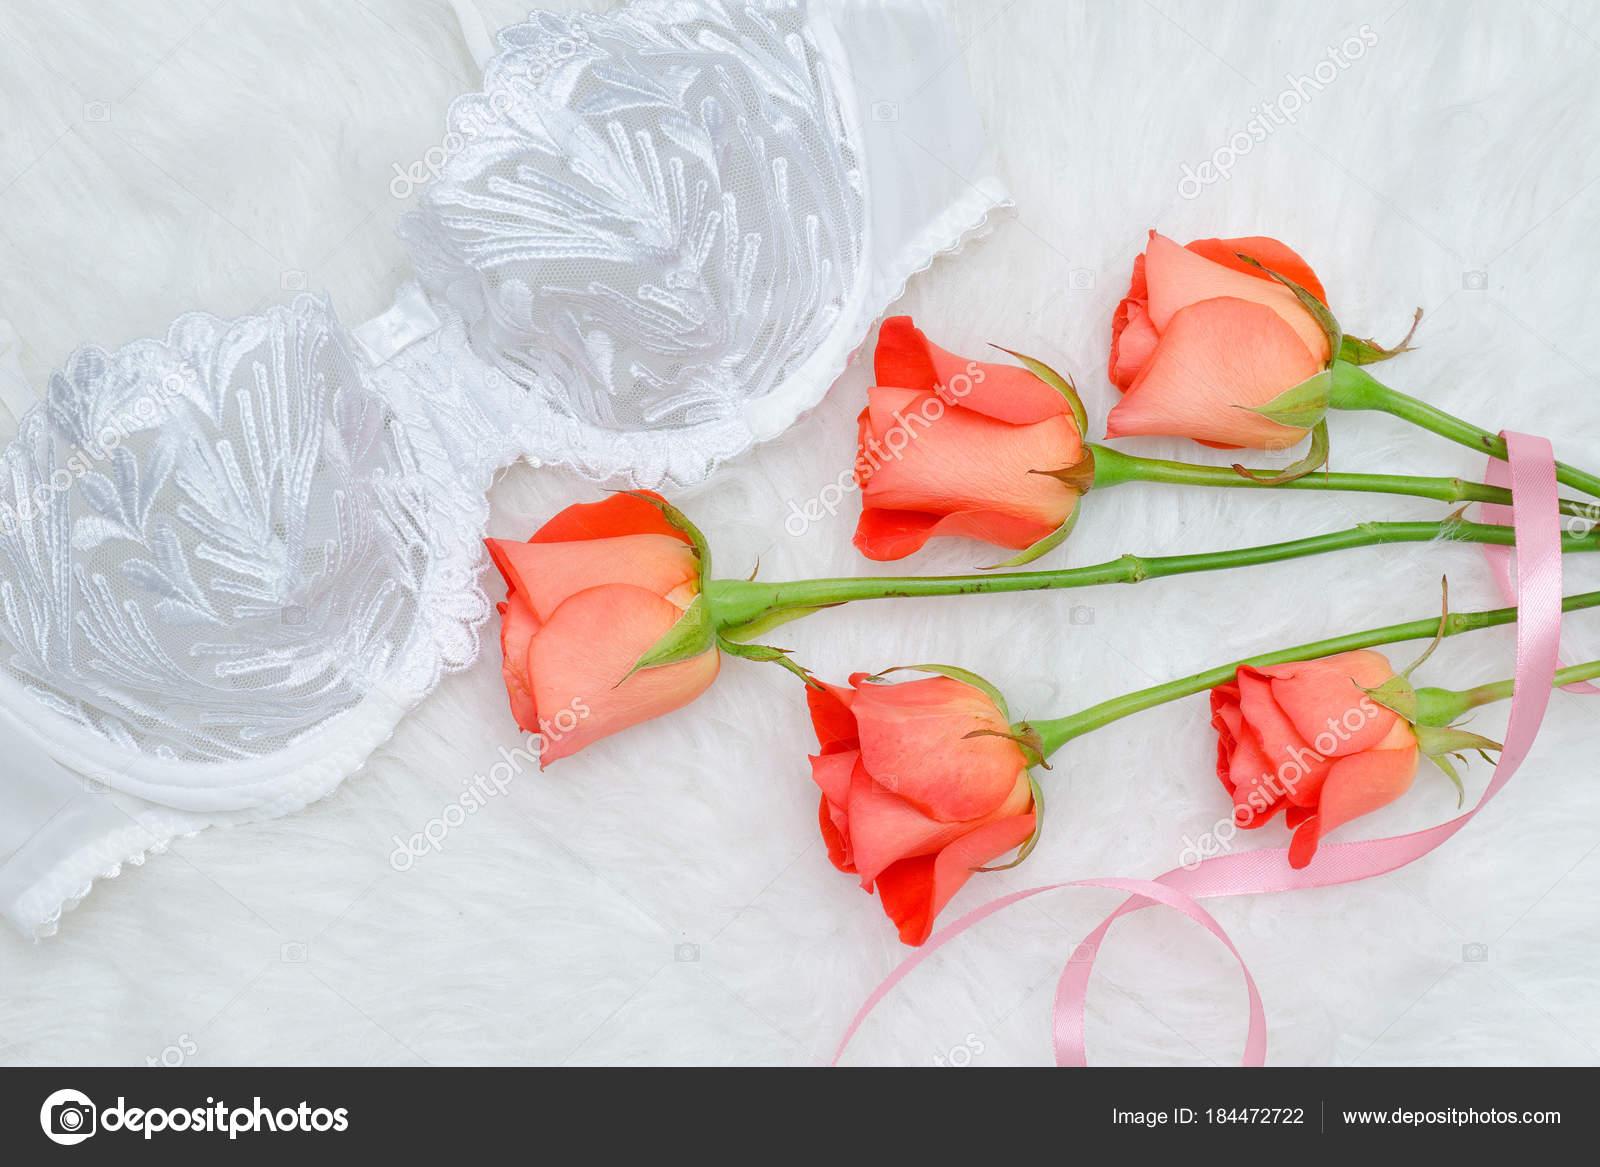 6735cf195fe3 Λευκό μπούστο με δαντέλα σε άσπρο fur. Πορτοκαλί τριαντάφυλλα — Φωτογραφία  Αρχείου